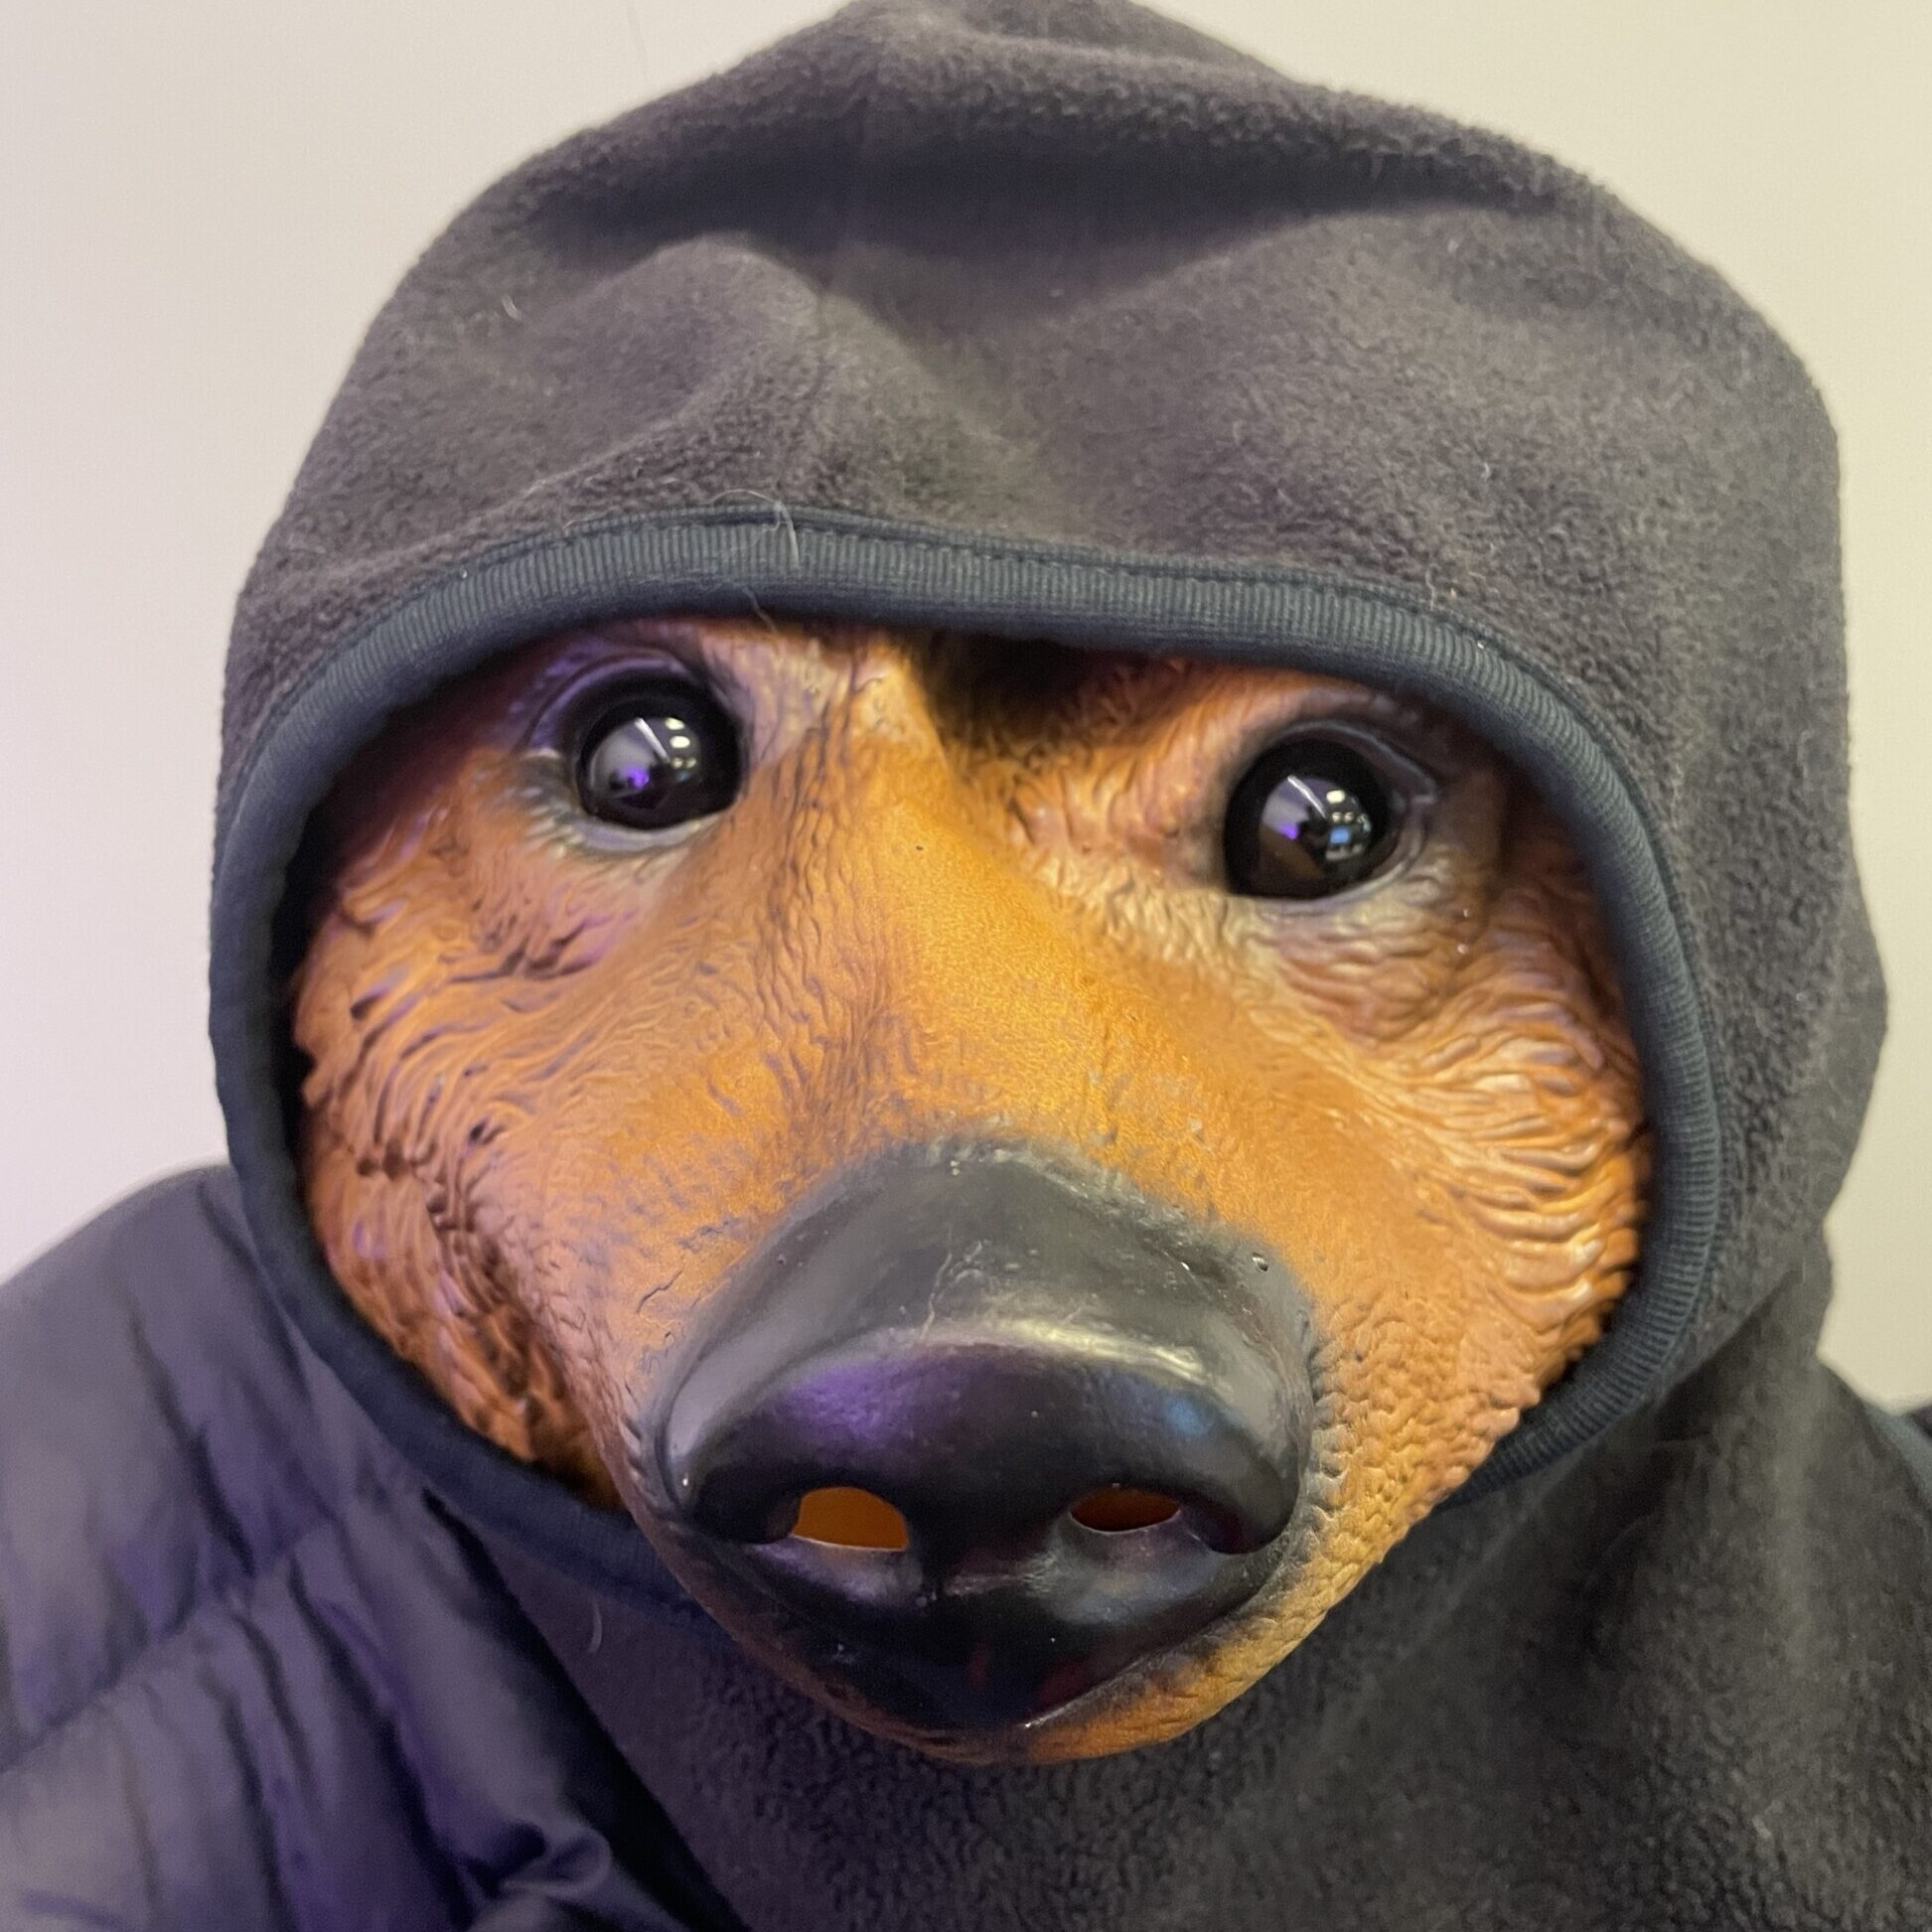 a hoodie on a bear costume